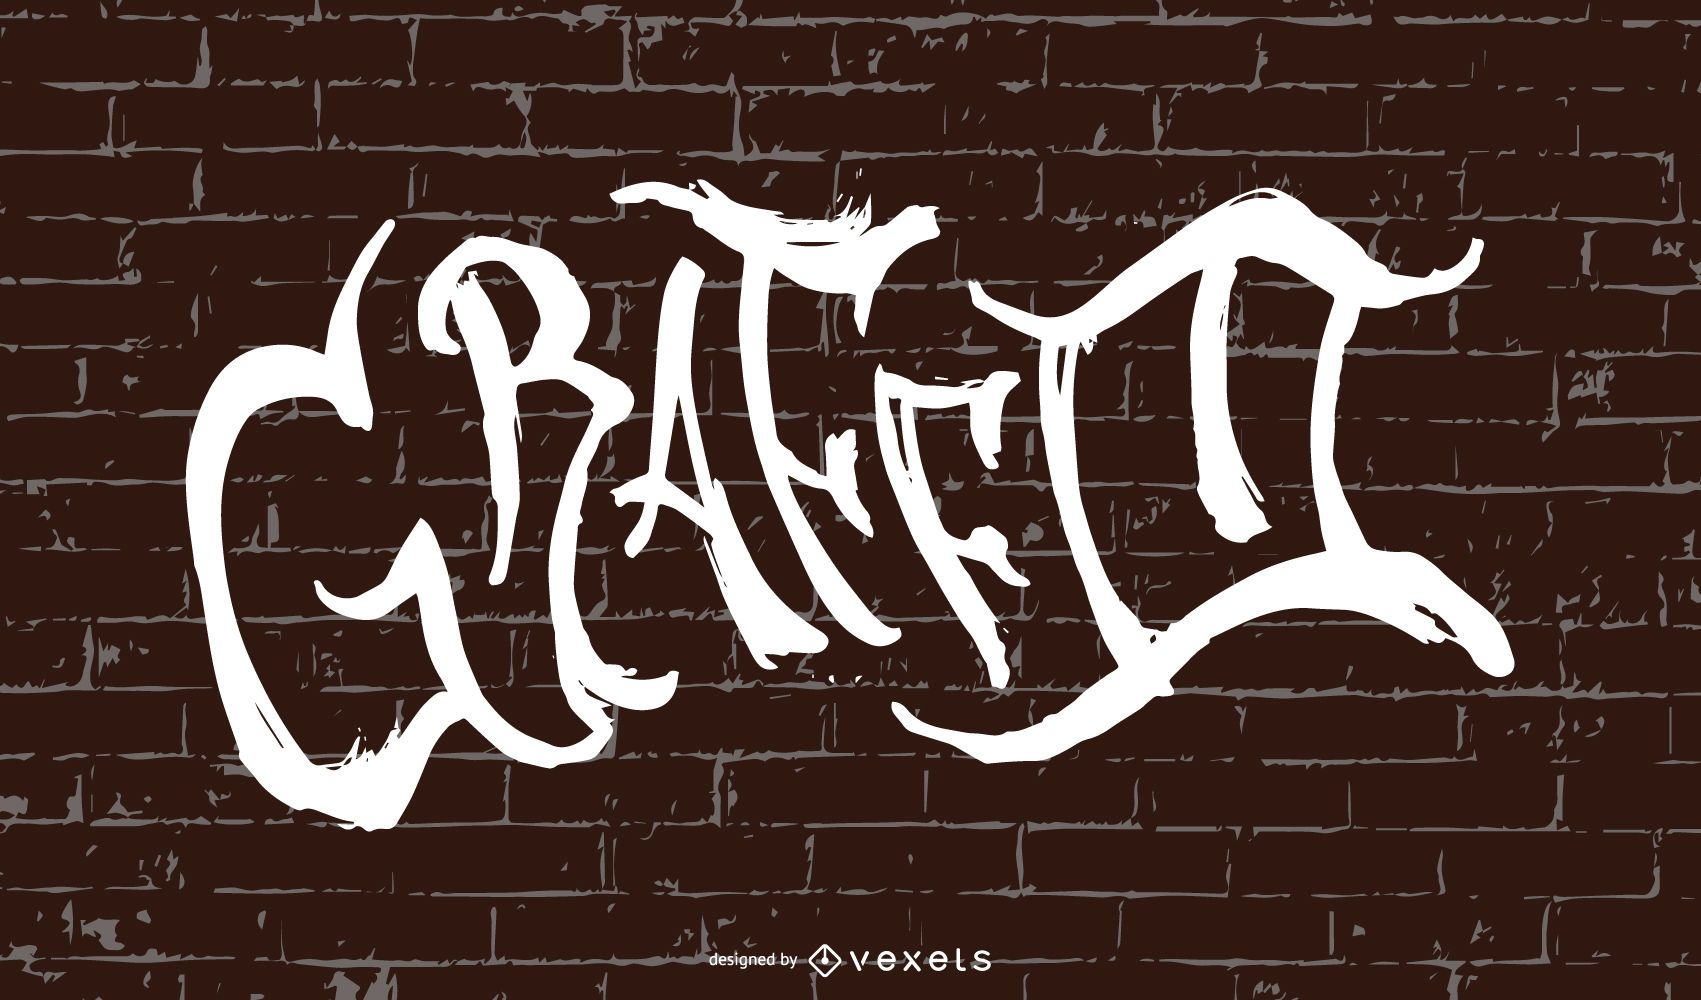 Hermoso dise?o de fuente de graffiti en la pared